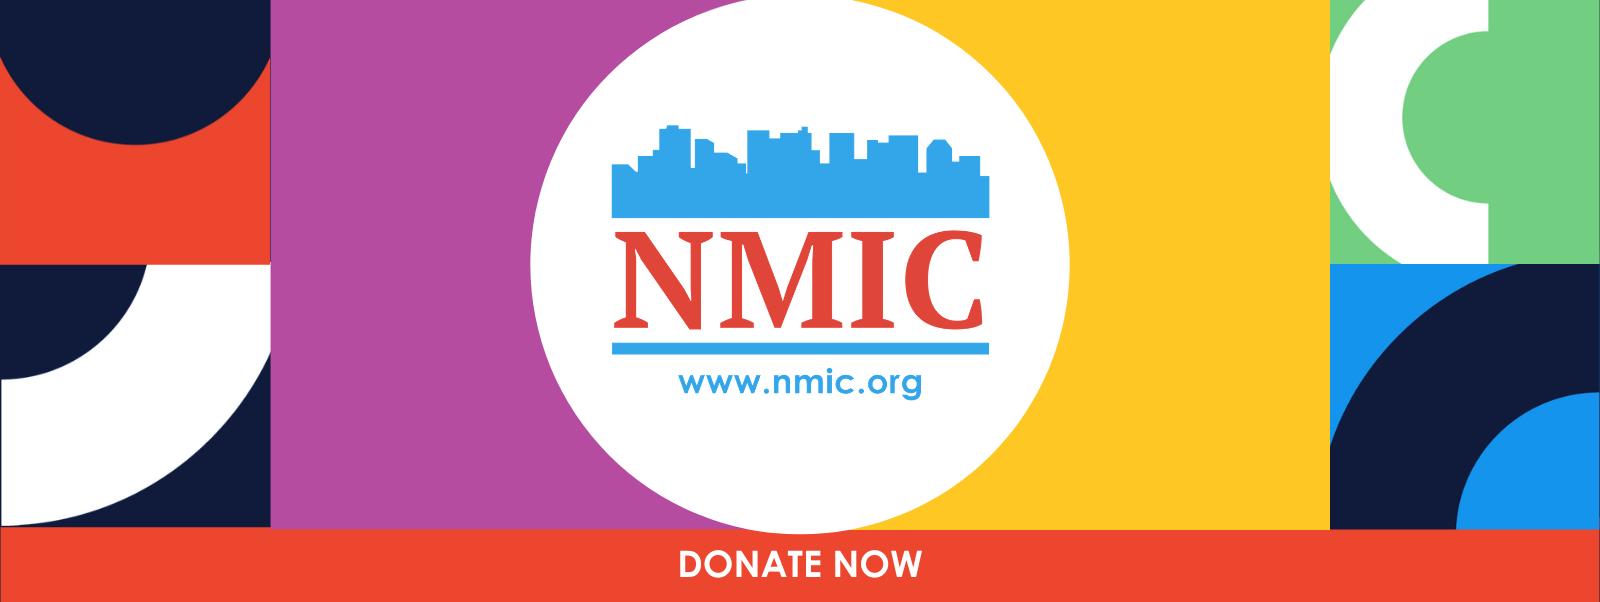 https://www.nmic.org/donate/